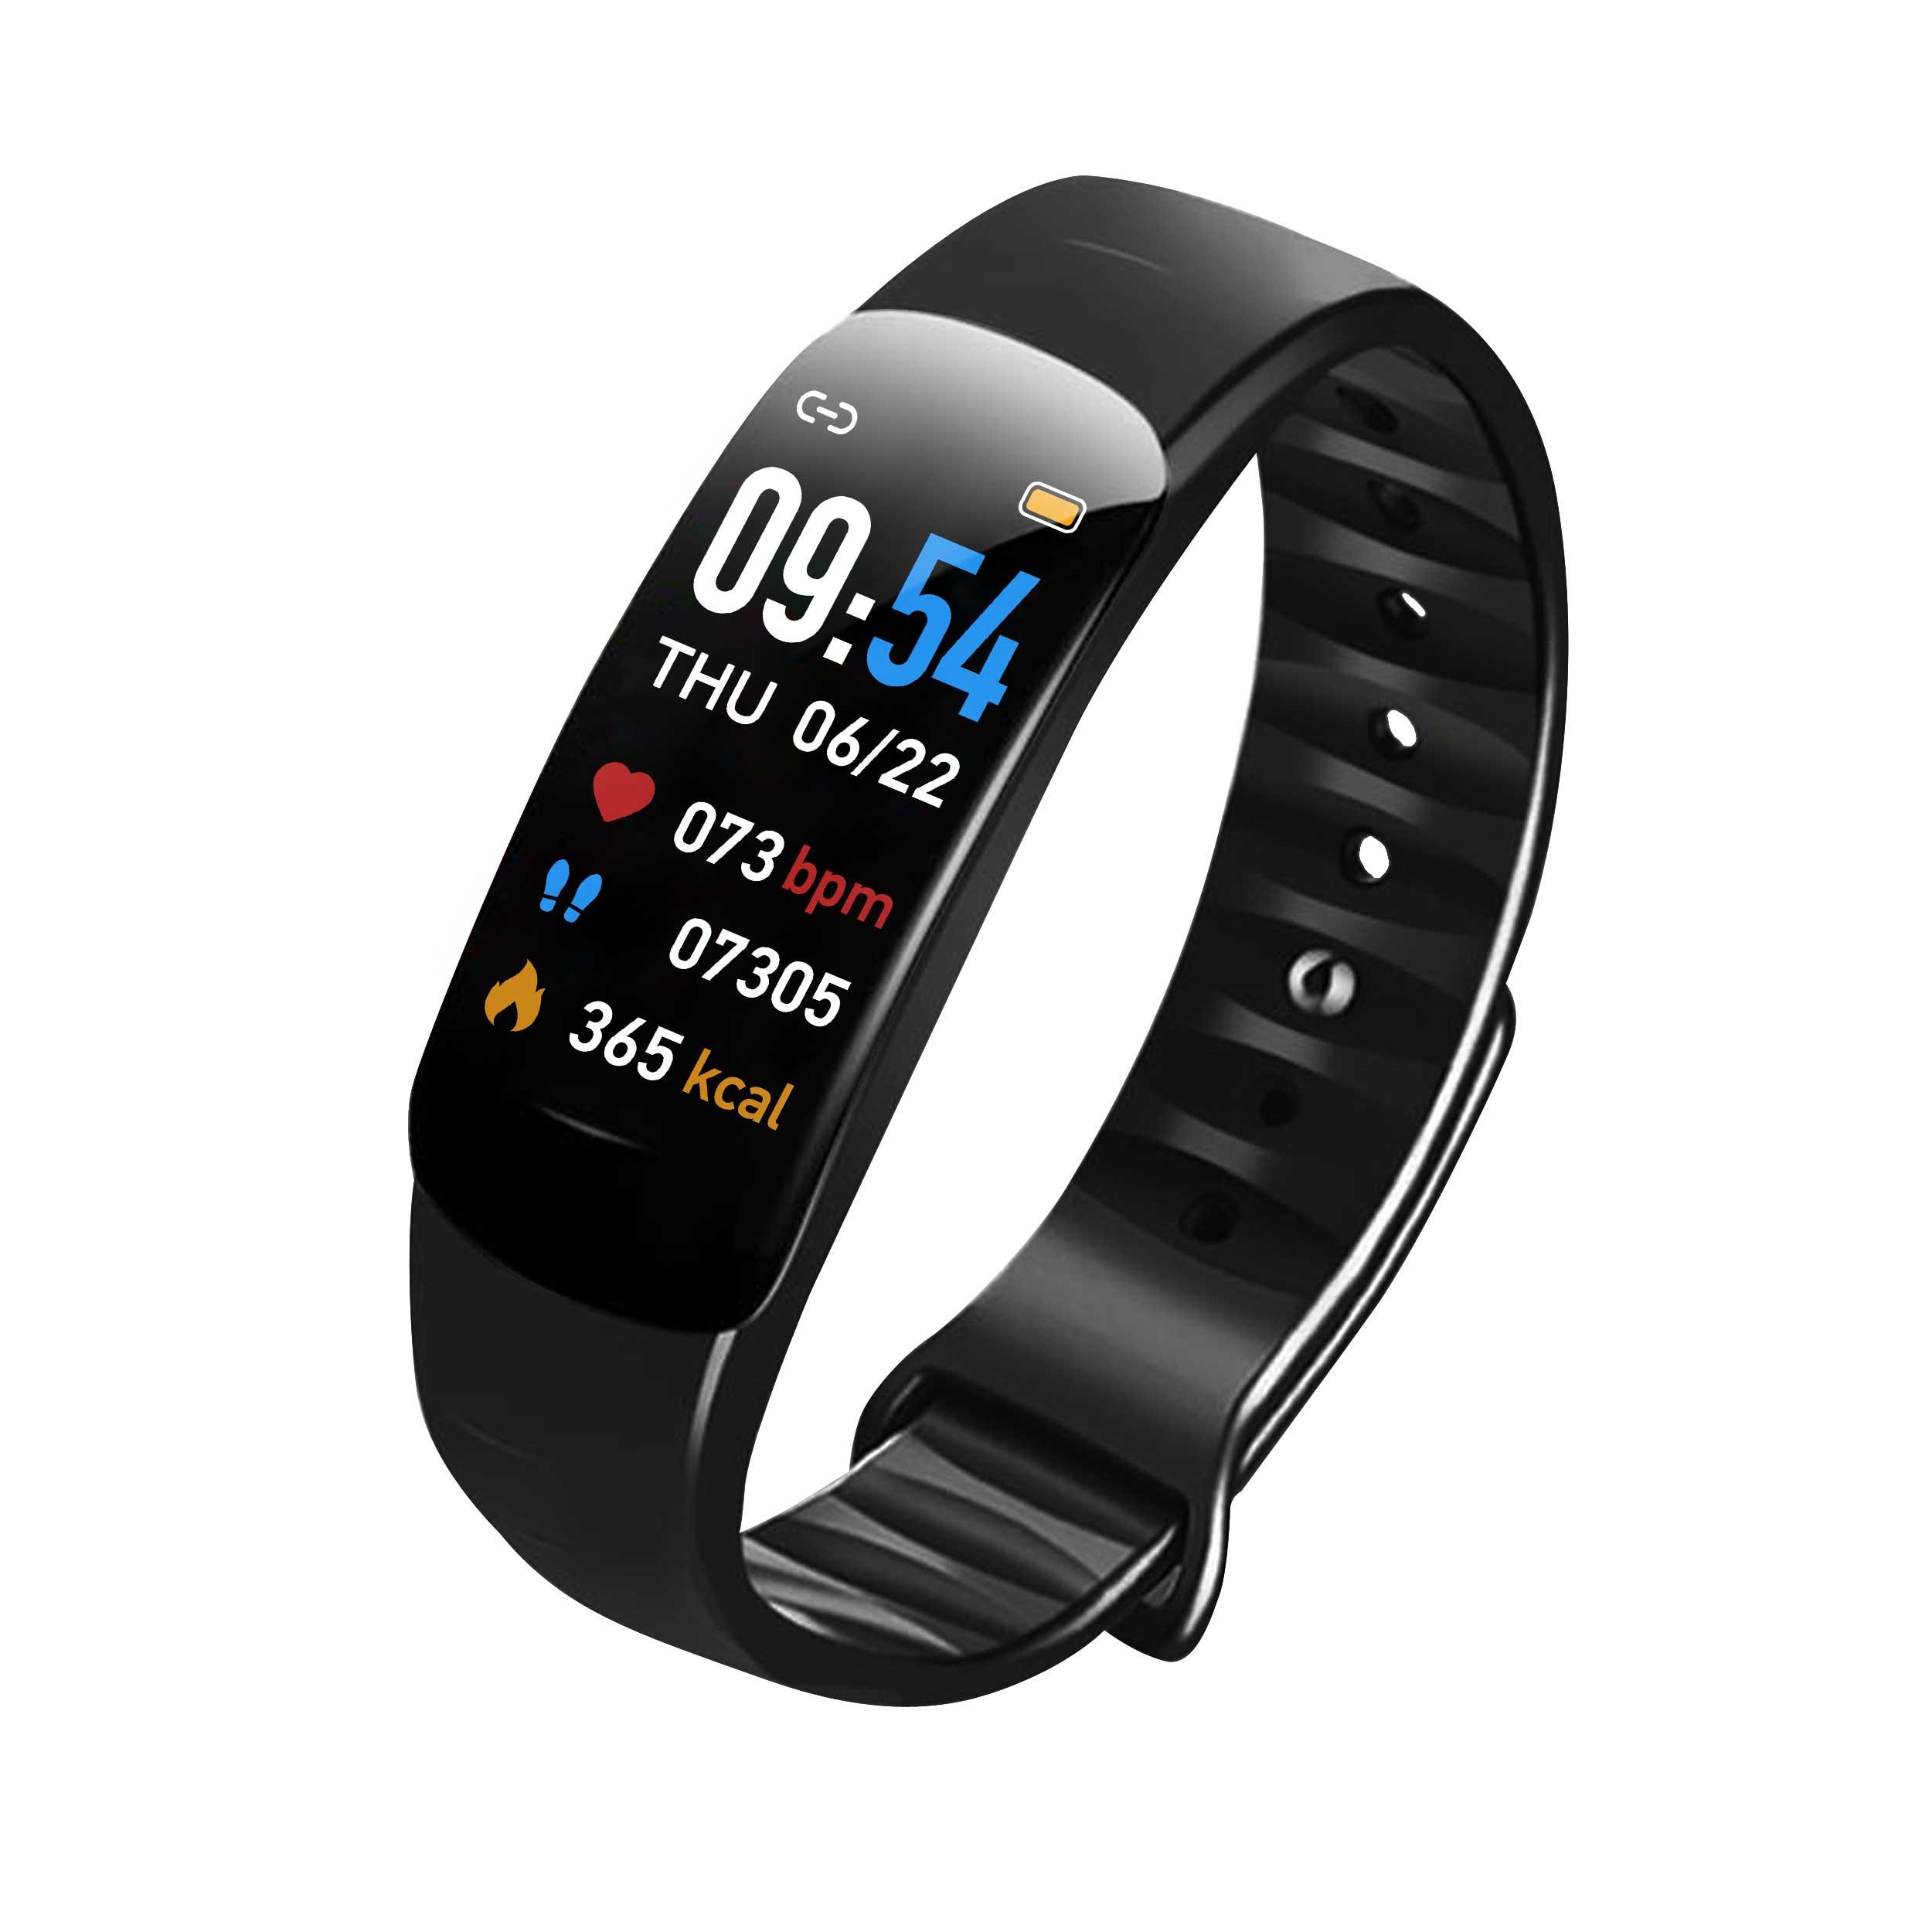 Fitness Bracelet Smart Watch Wristband Pedometer Heart Rate Monitor Activity Tracker smart bracelet black